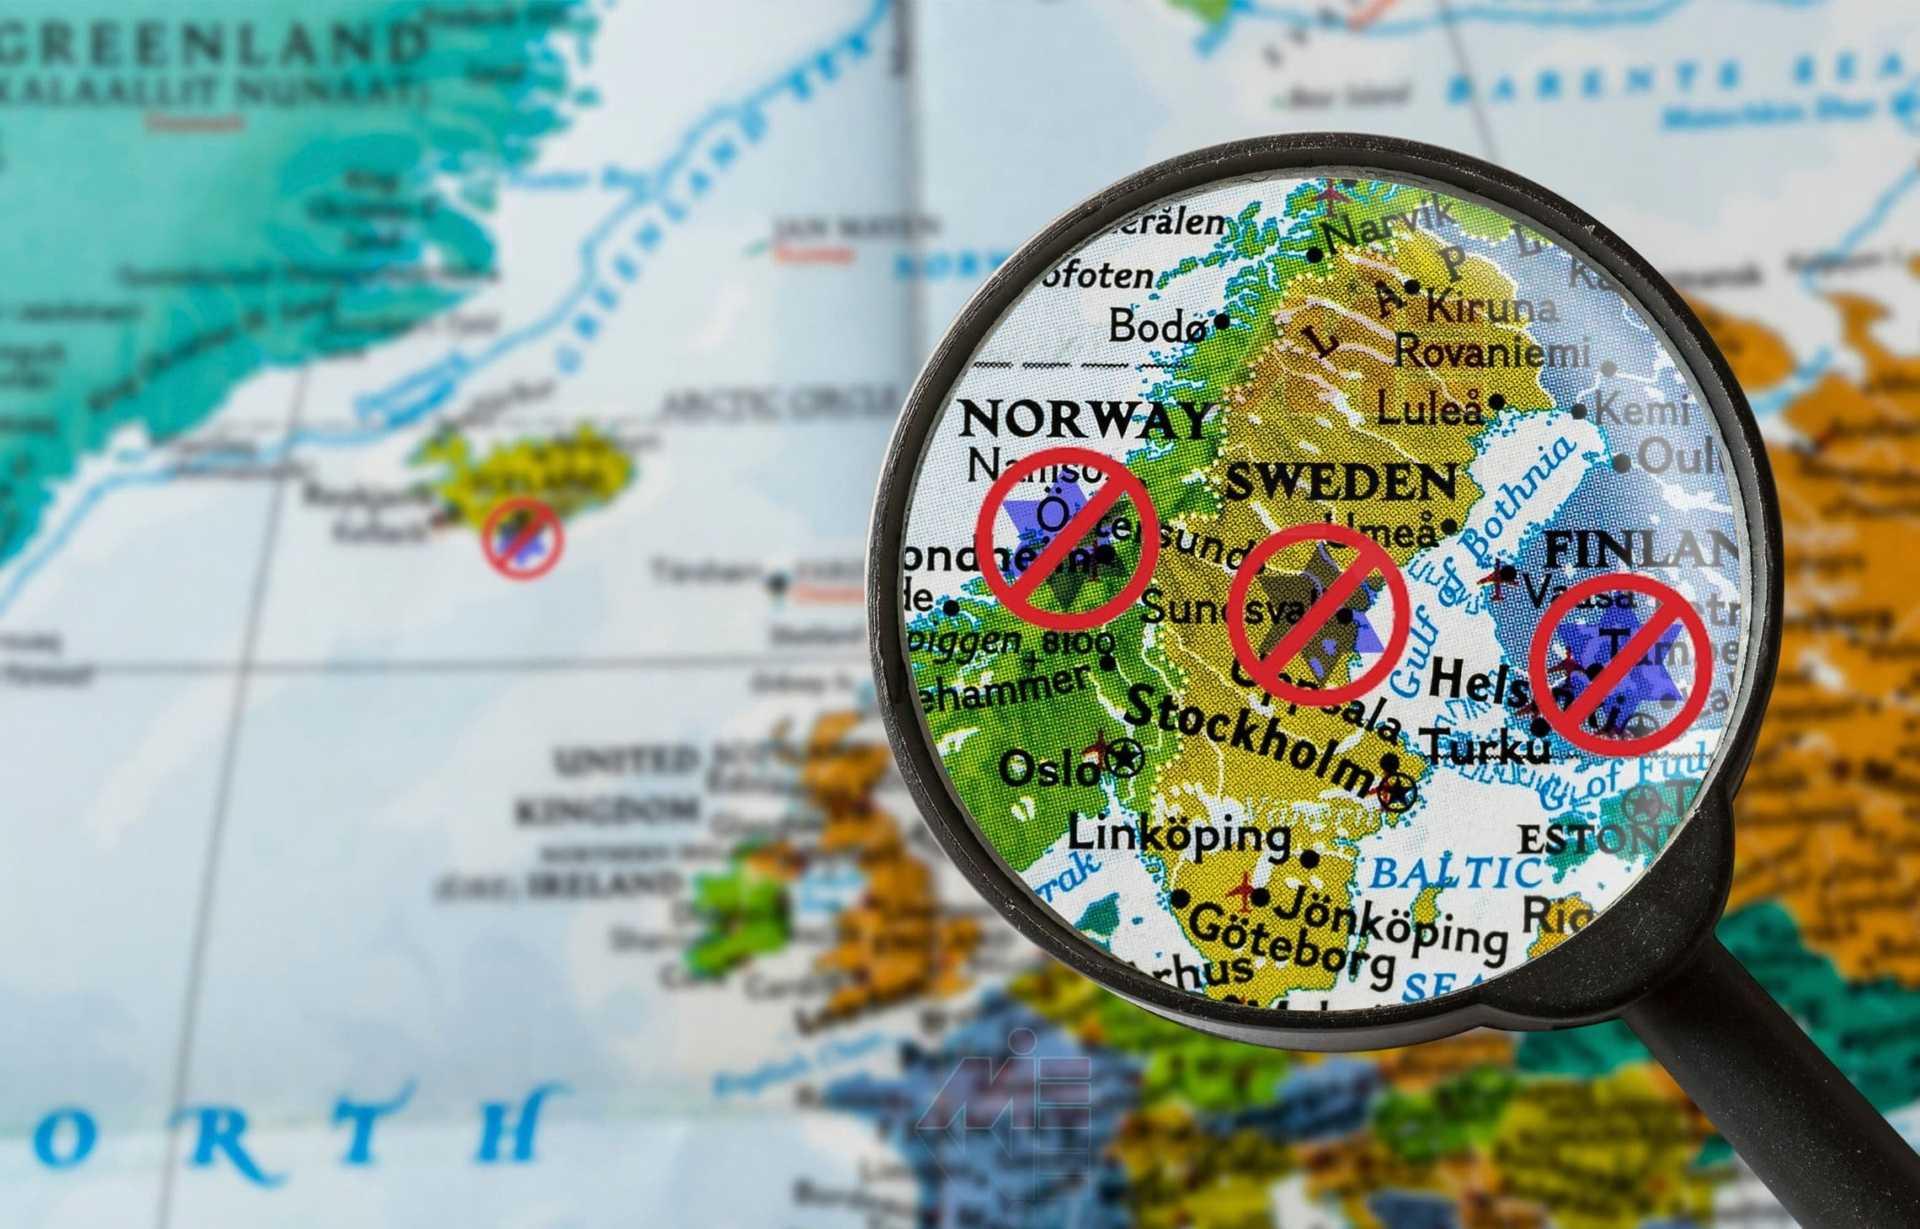 scandinavia hero image credit nikki casey 1519677736 تحصیل در اسکاندیناوی